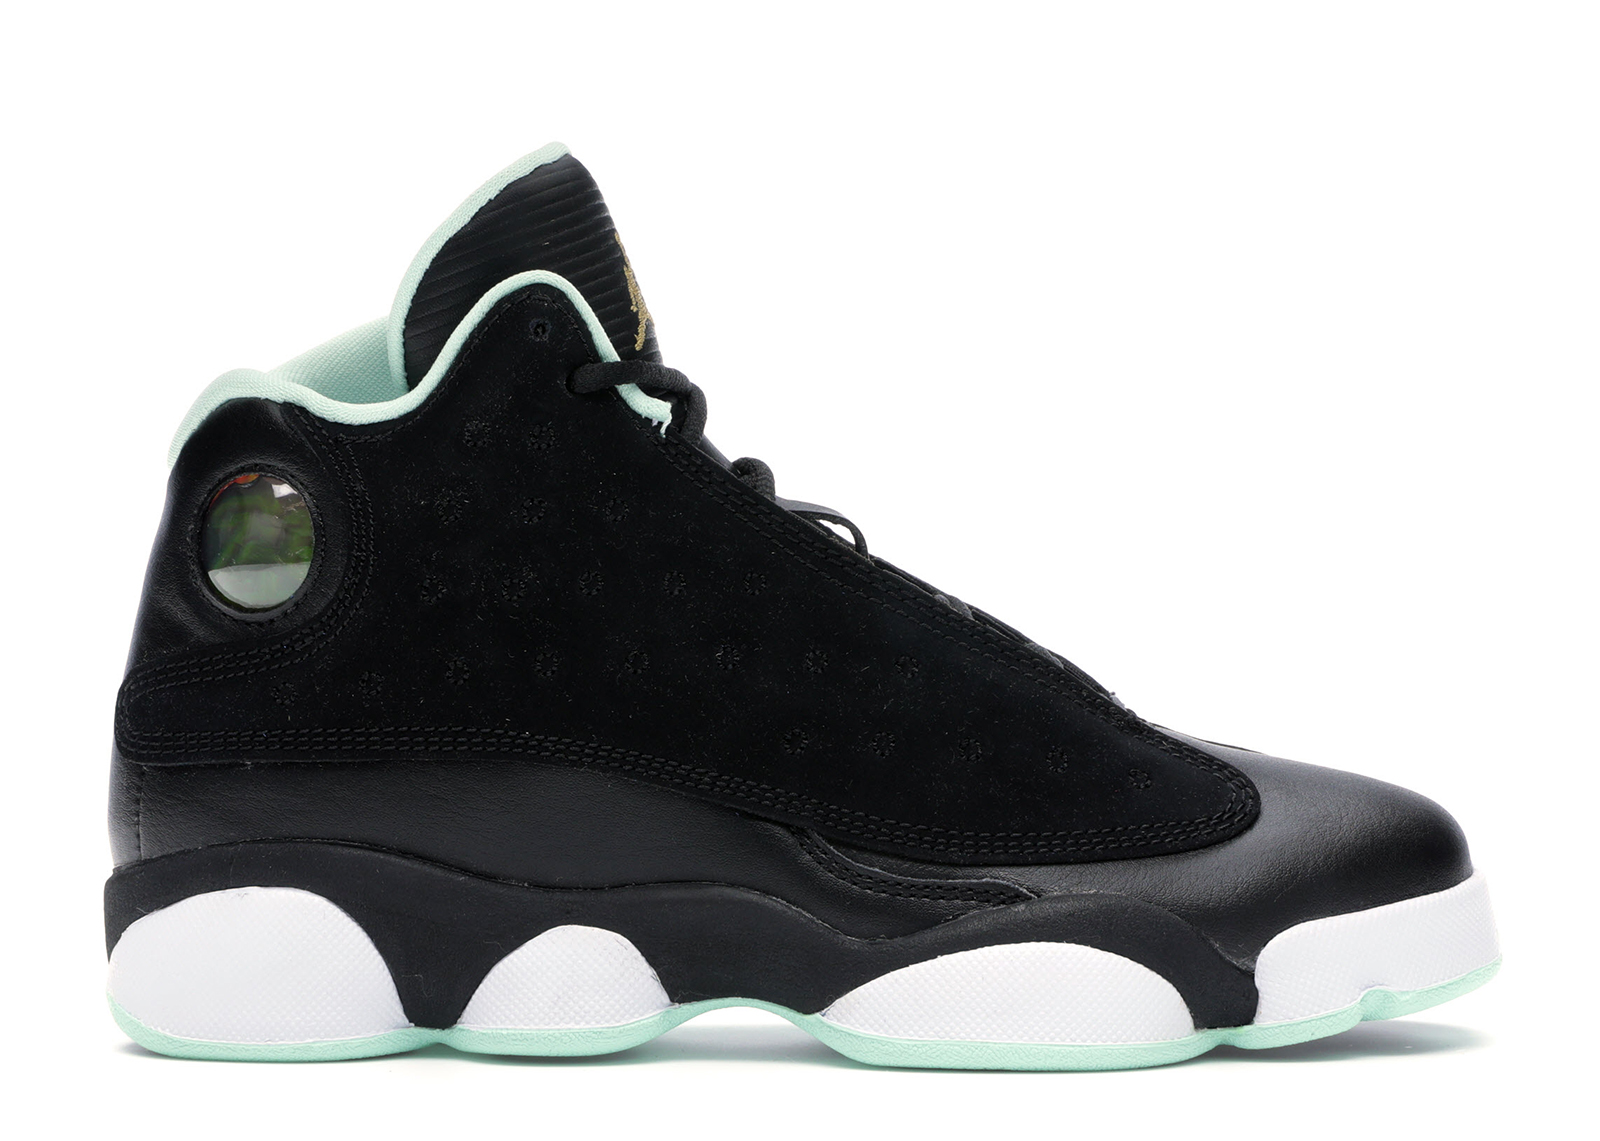 Jordan 13 Retro Black Mint Foam (GS